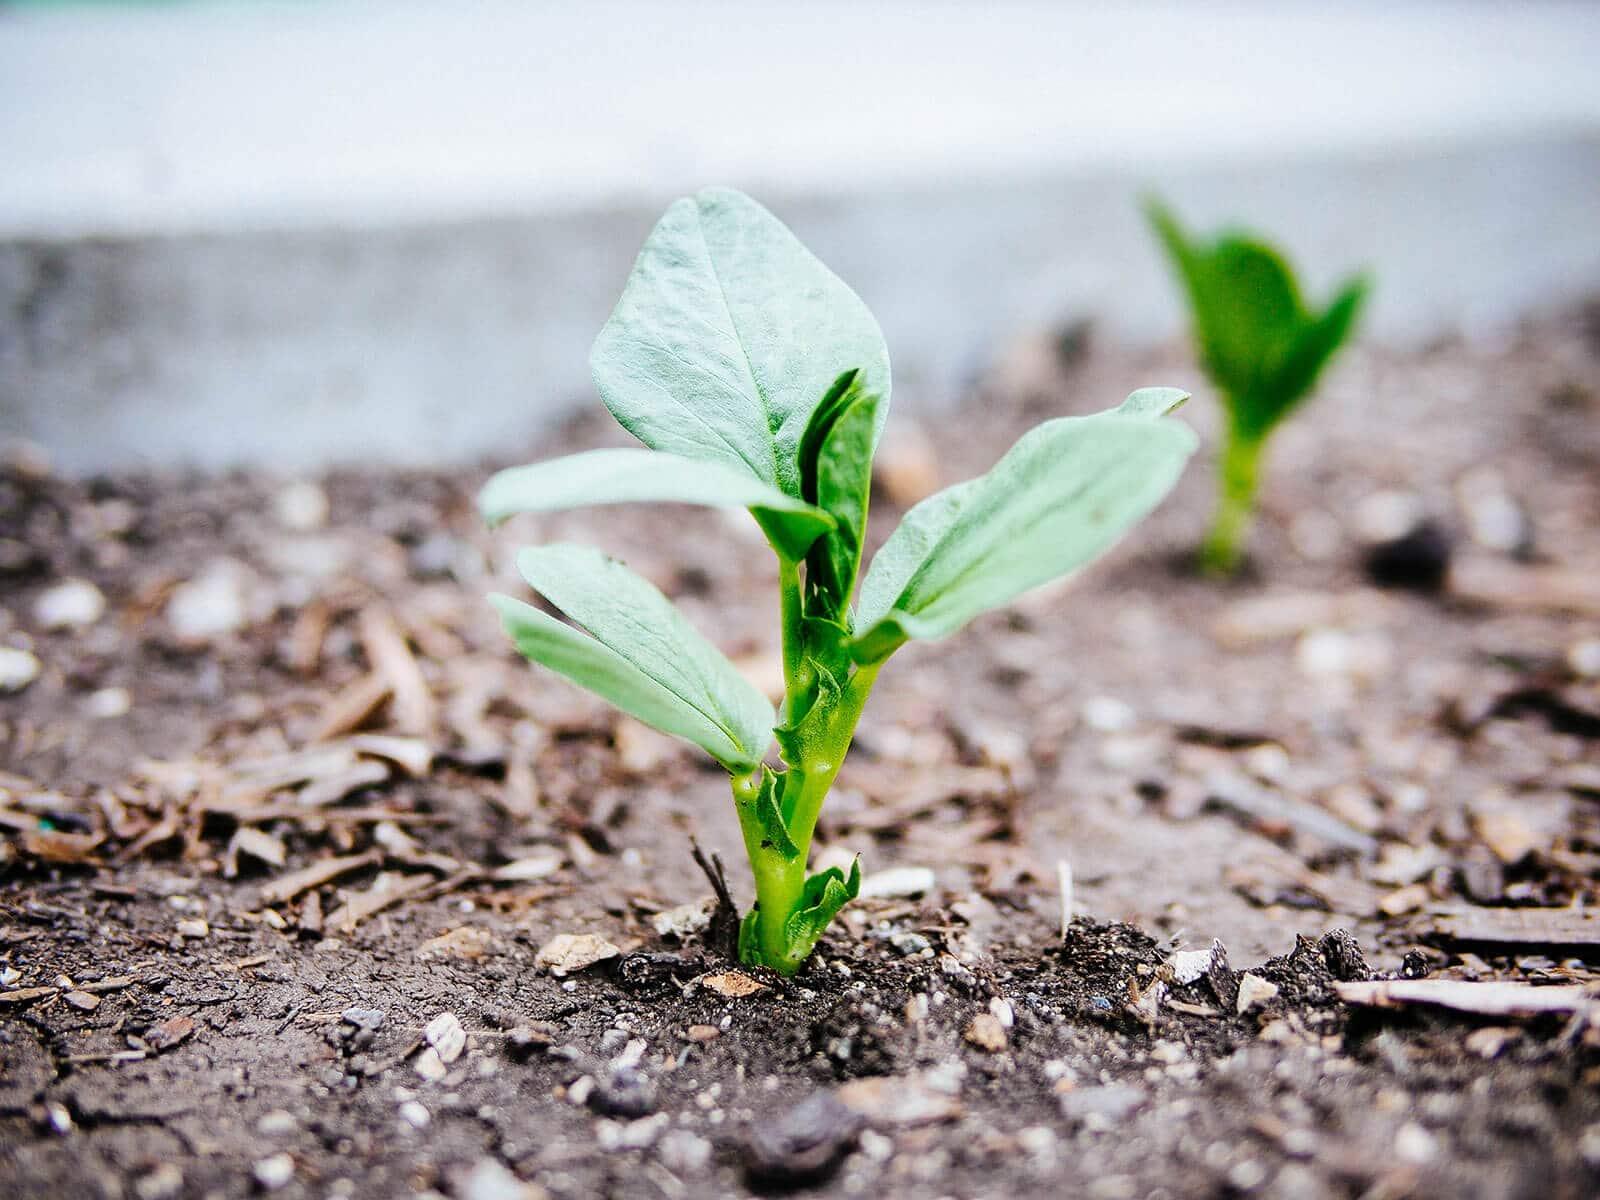 Broad bean seedling in the soil